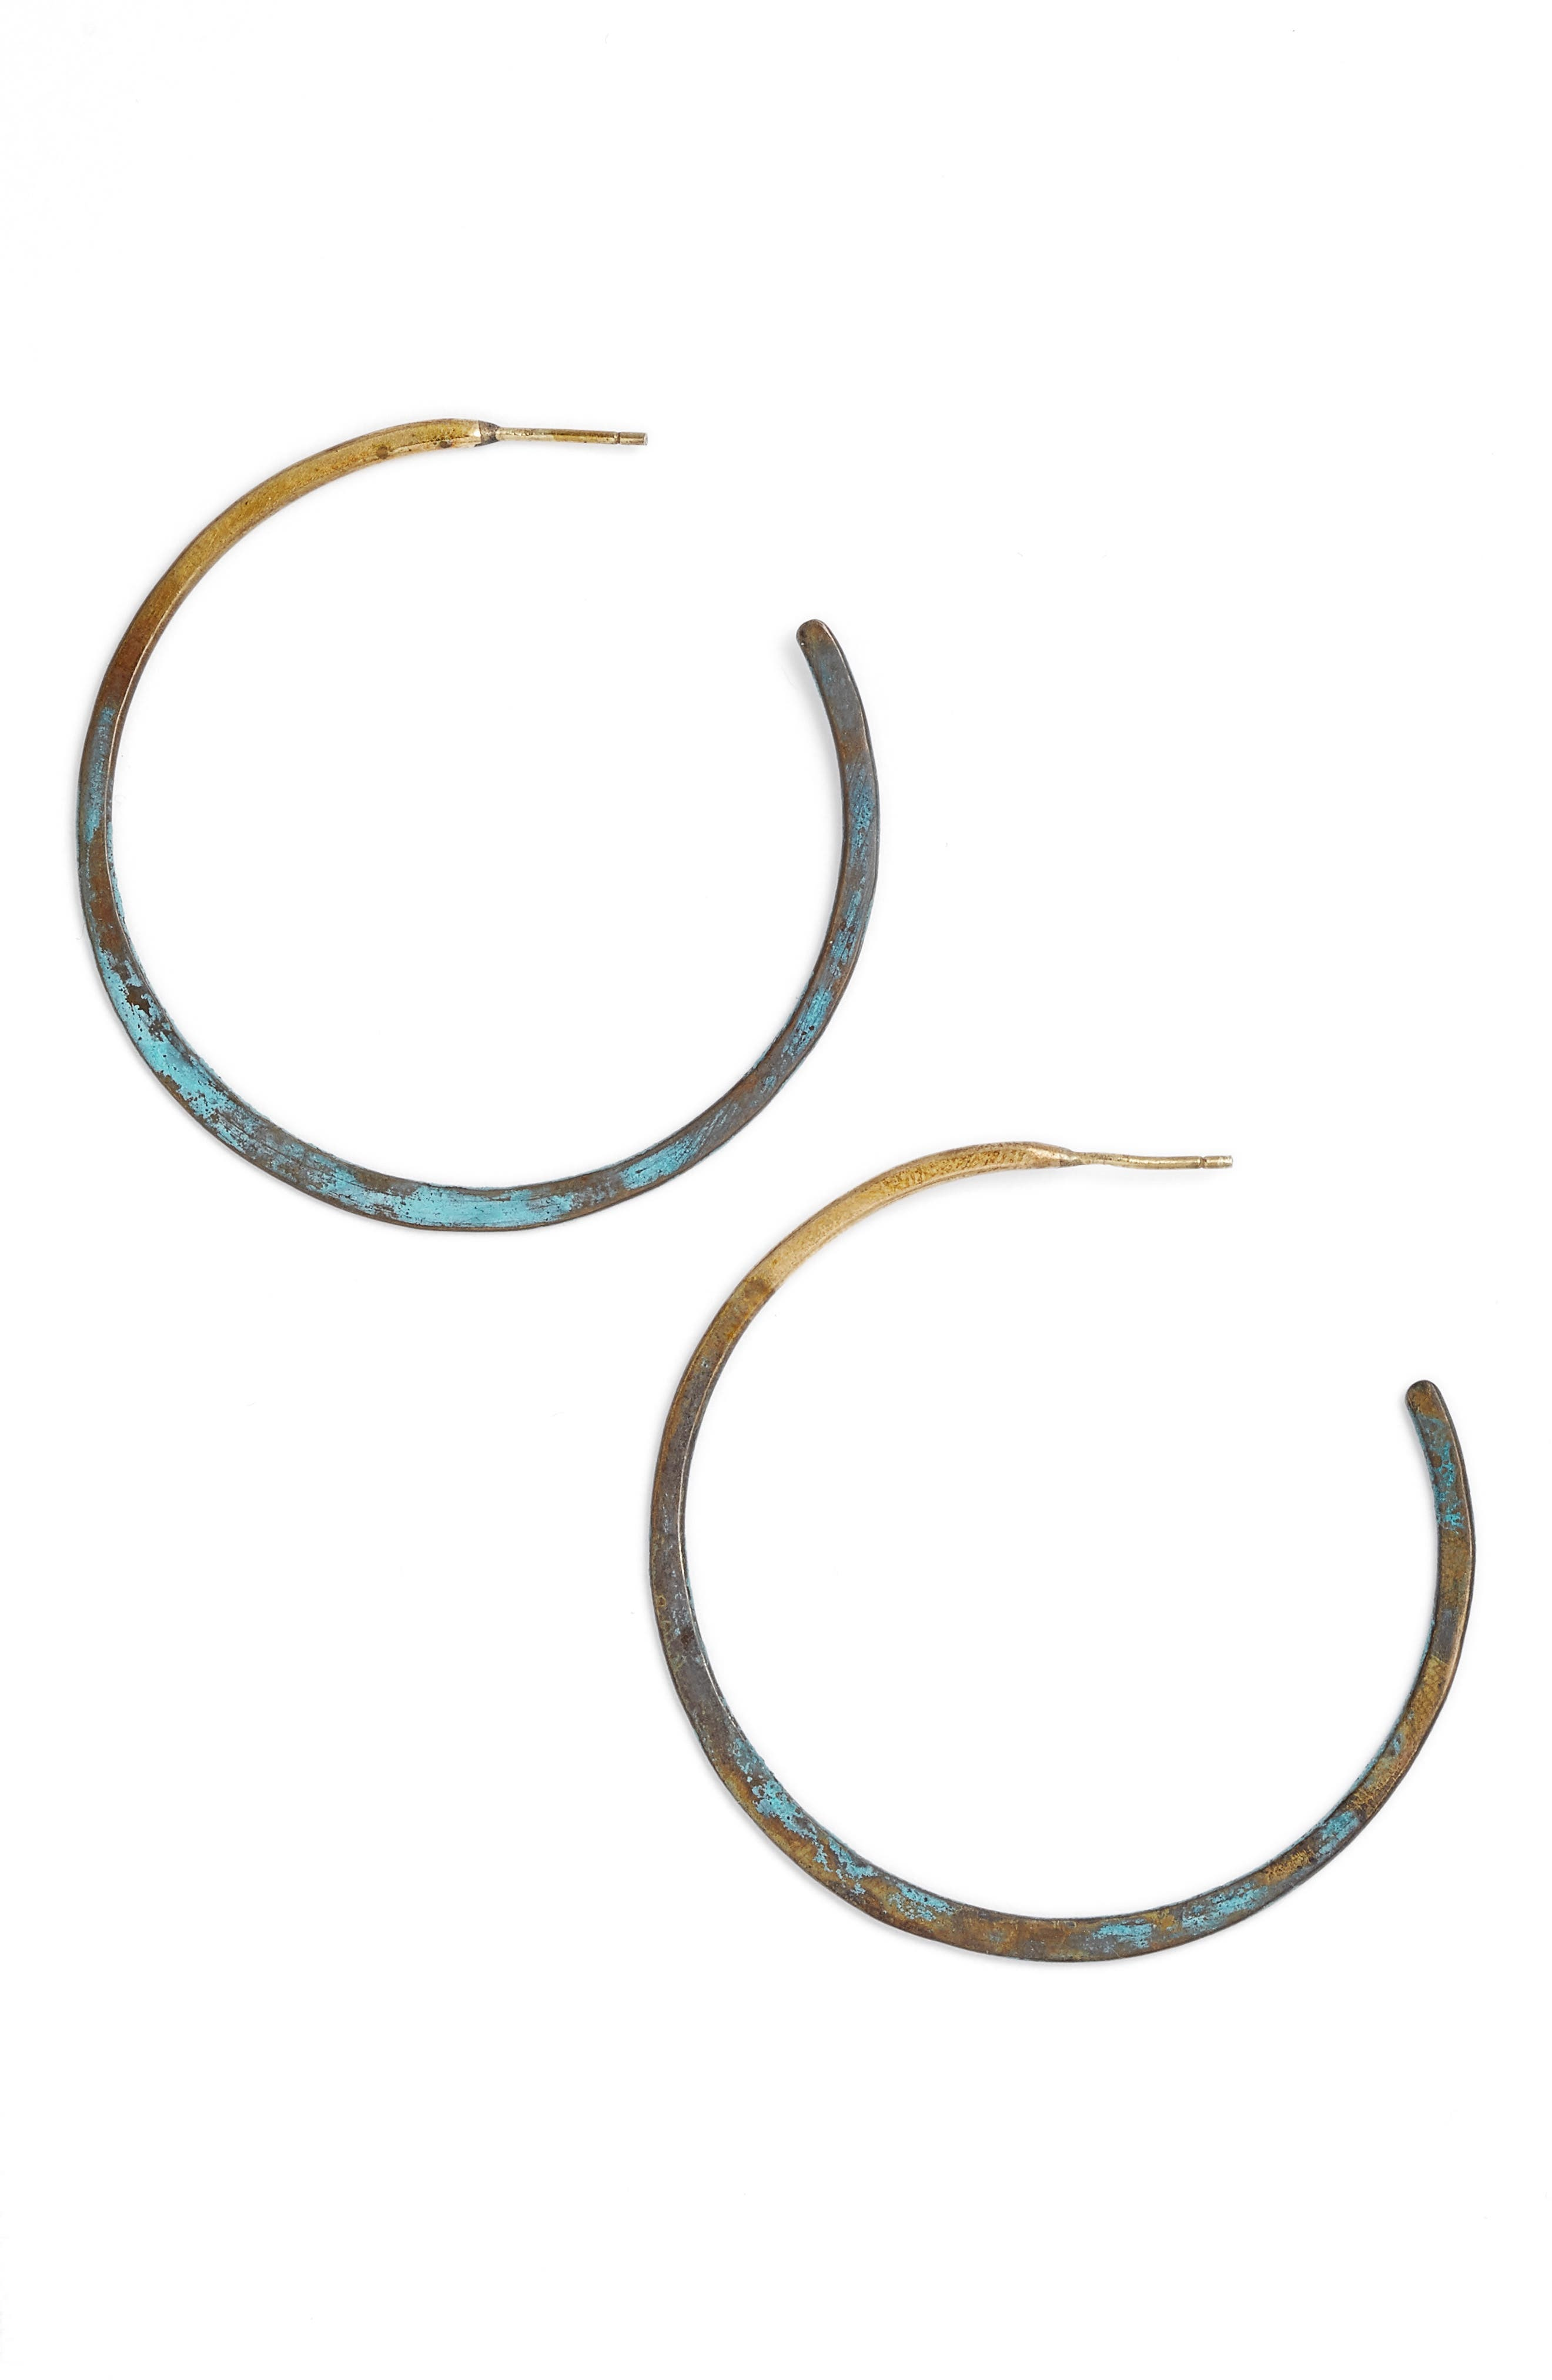 Patina Hoop Earrings,                             Main thumbnail 1, color,                             301